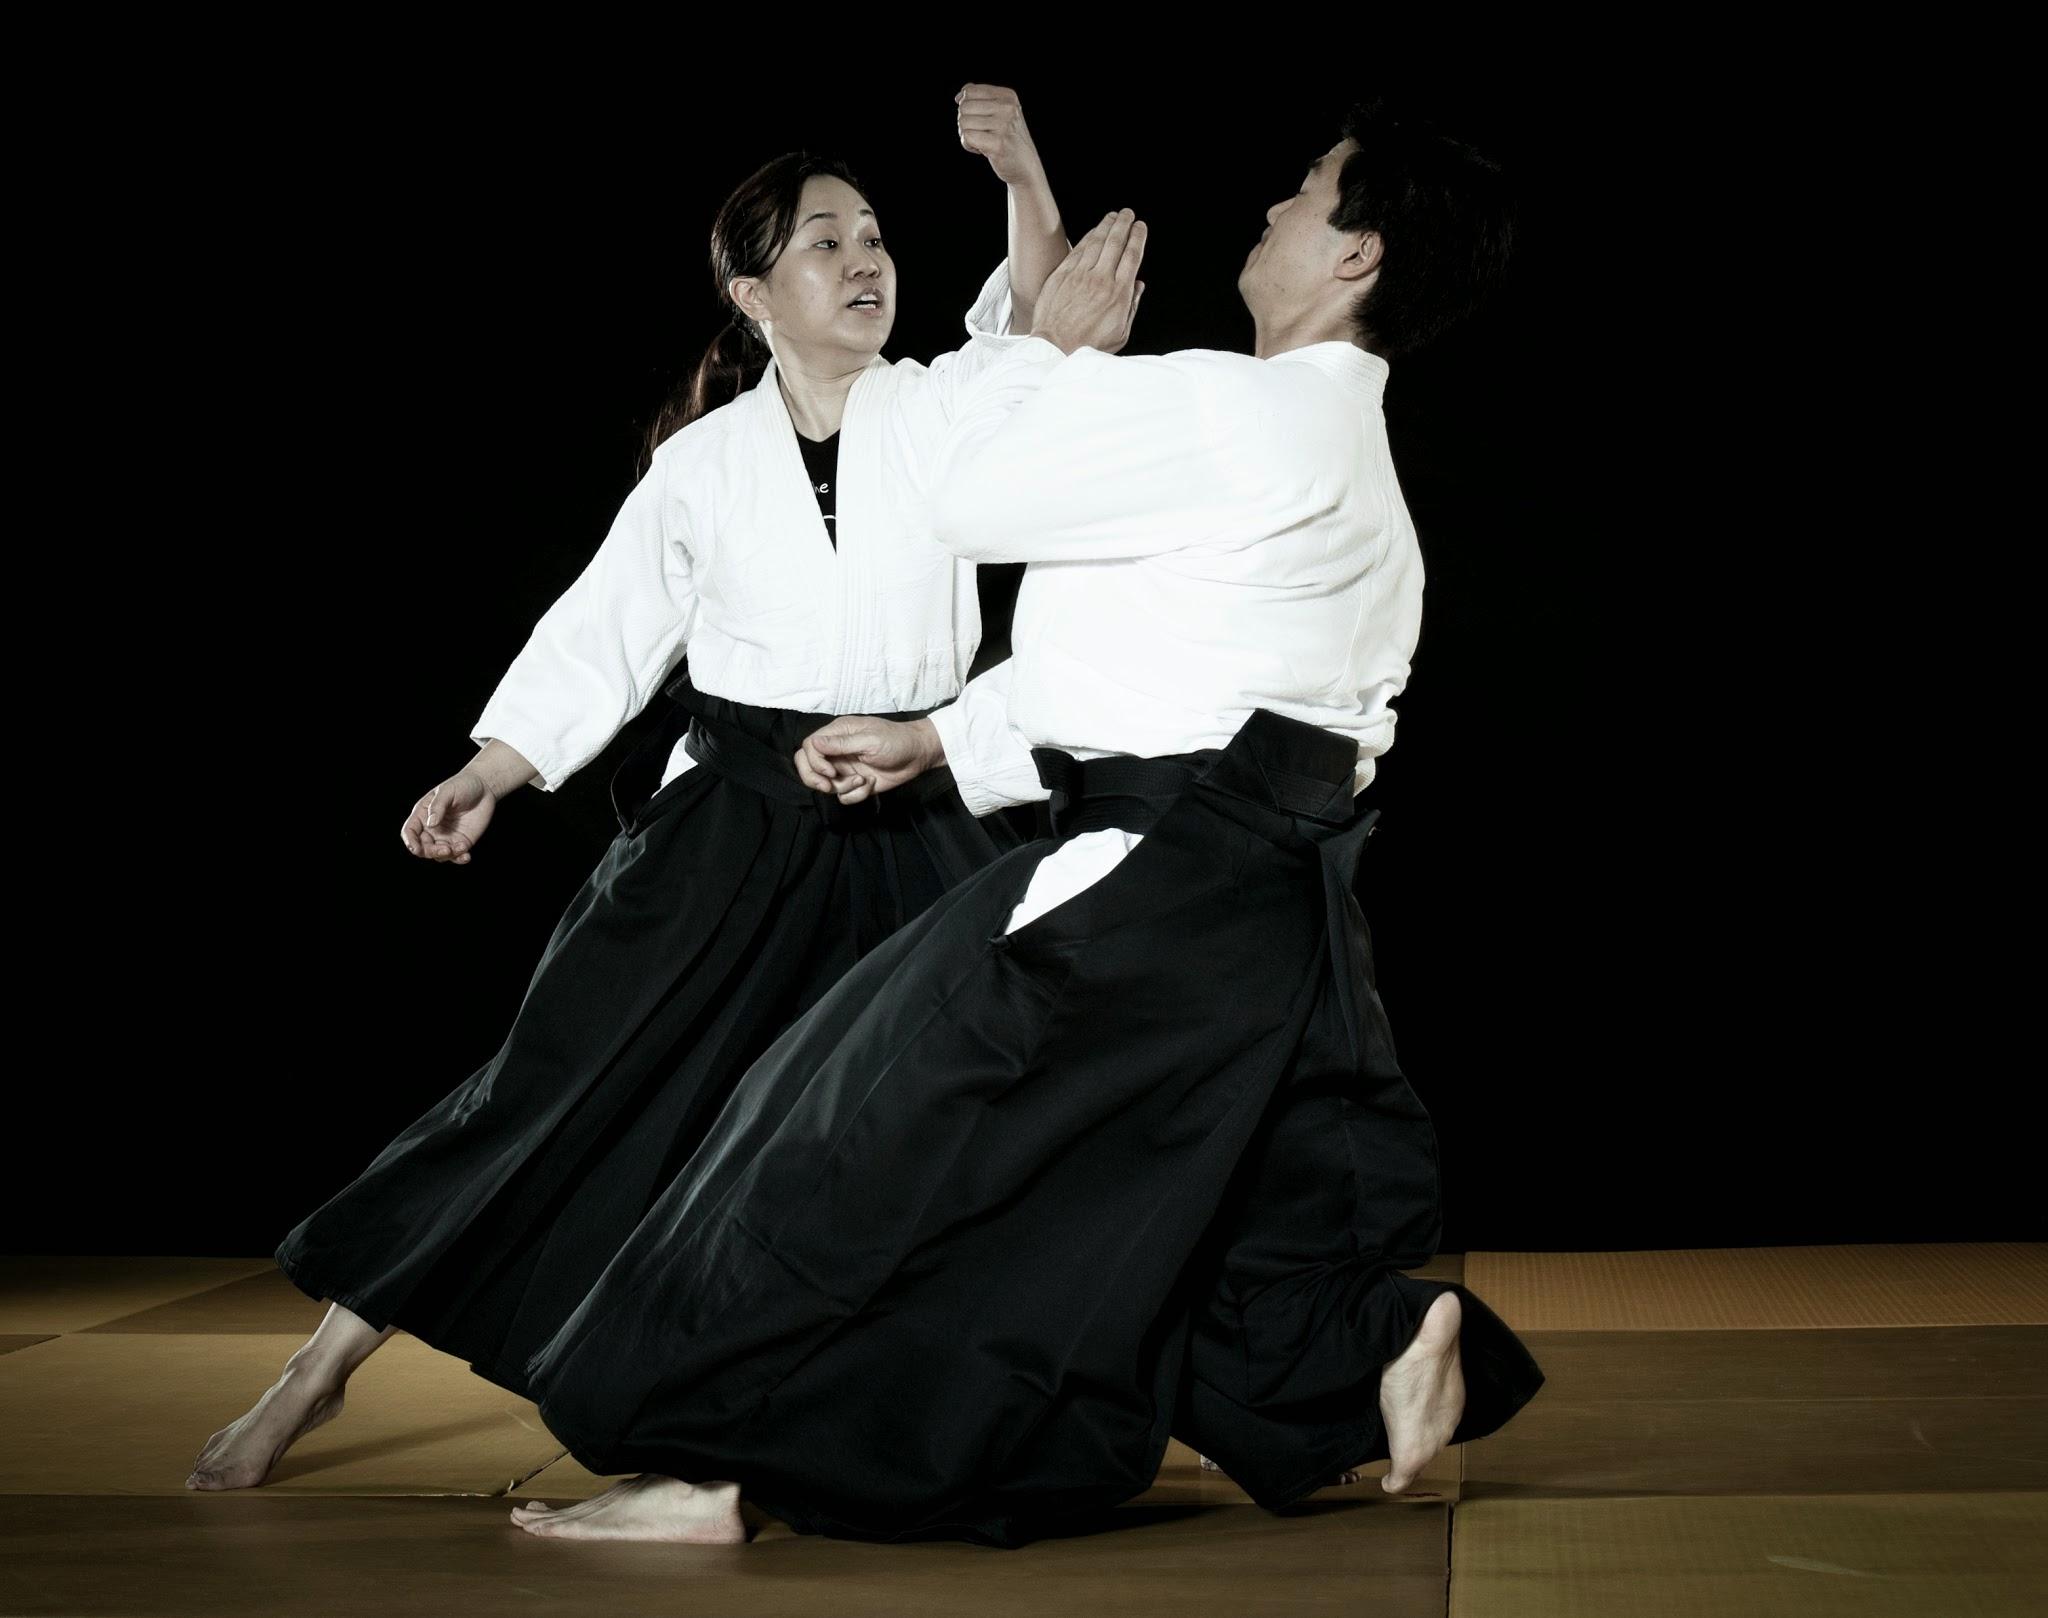 Aikido_Mar_2014-1032.jpg